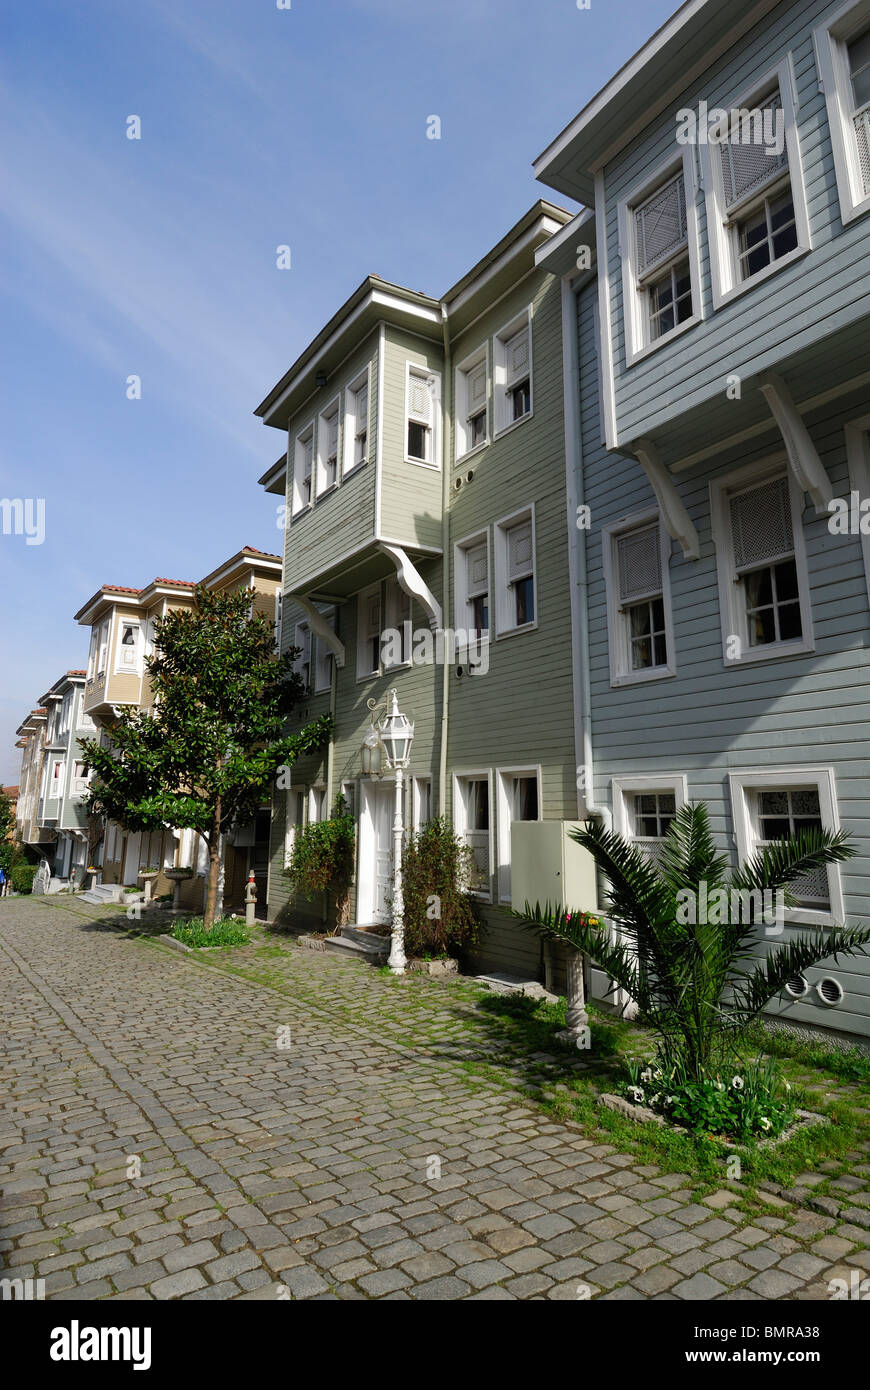 Istanbul. Turkei. Traditionelle Holzhäuser auf Sogukcesme Sok, Sultanahmet. Ayasofya Villen. Stockbild